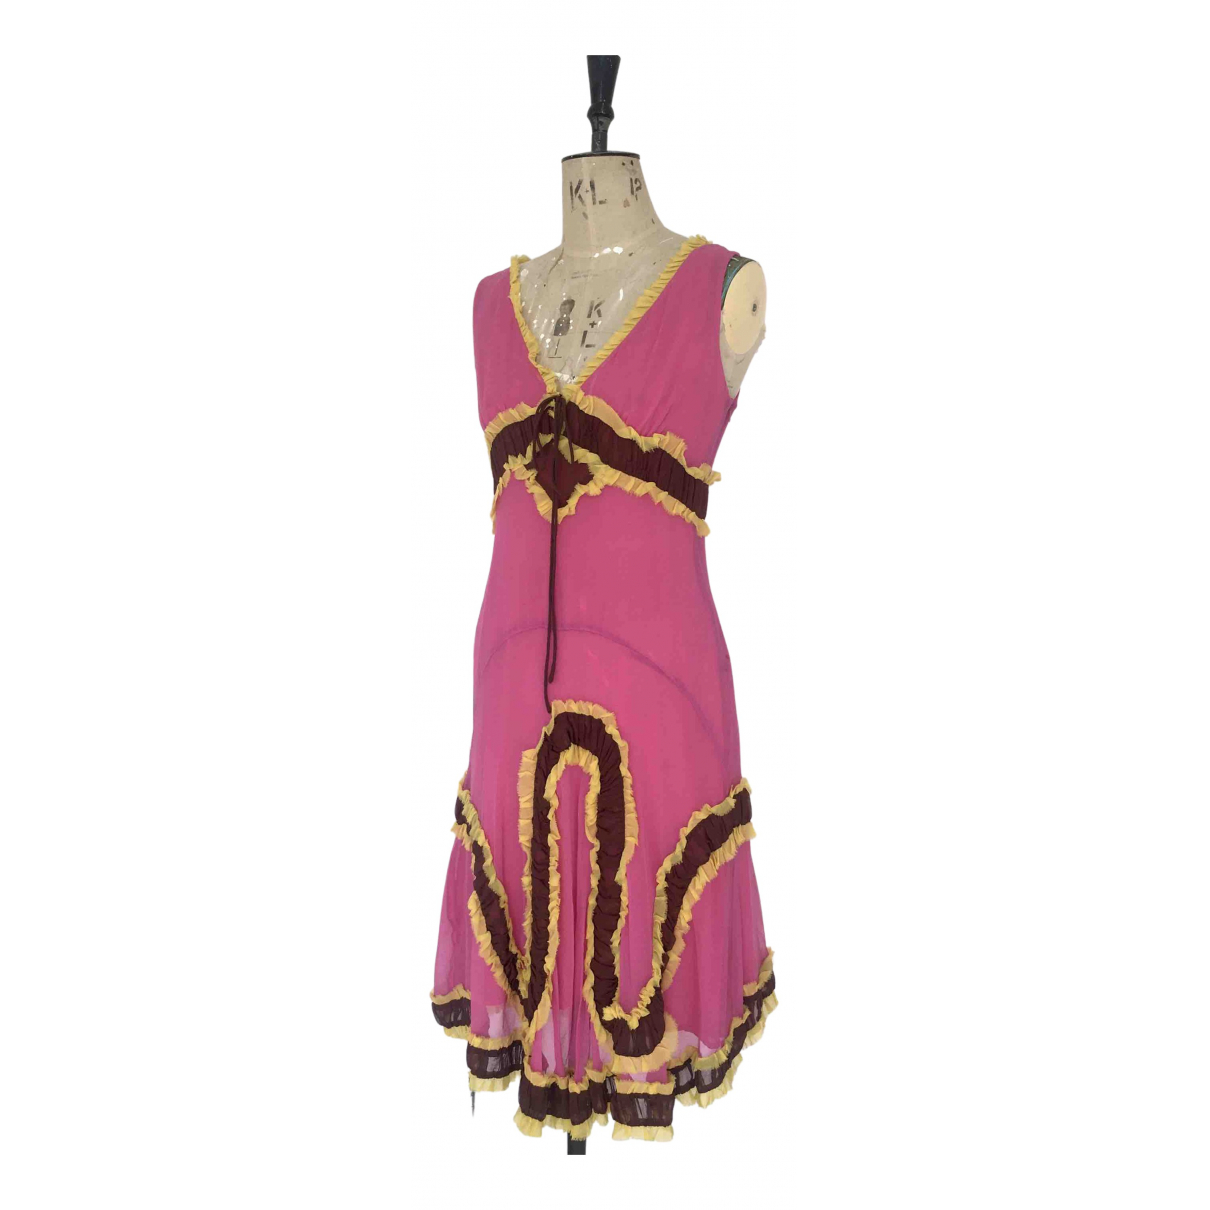 Chloé \N Pink Silk dress for Women S International